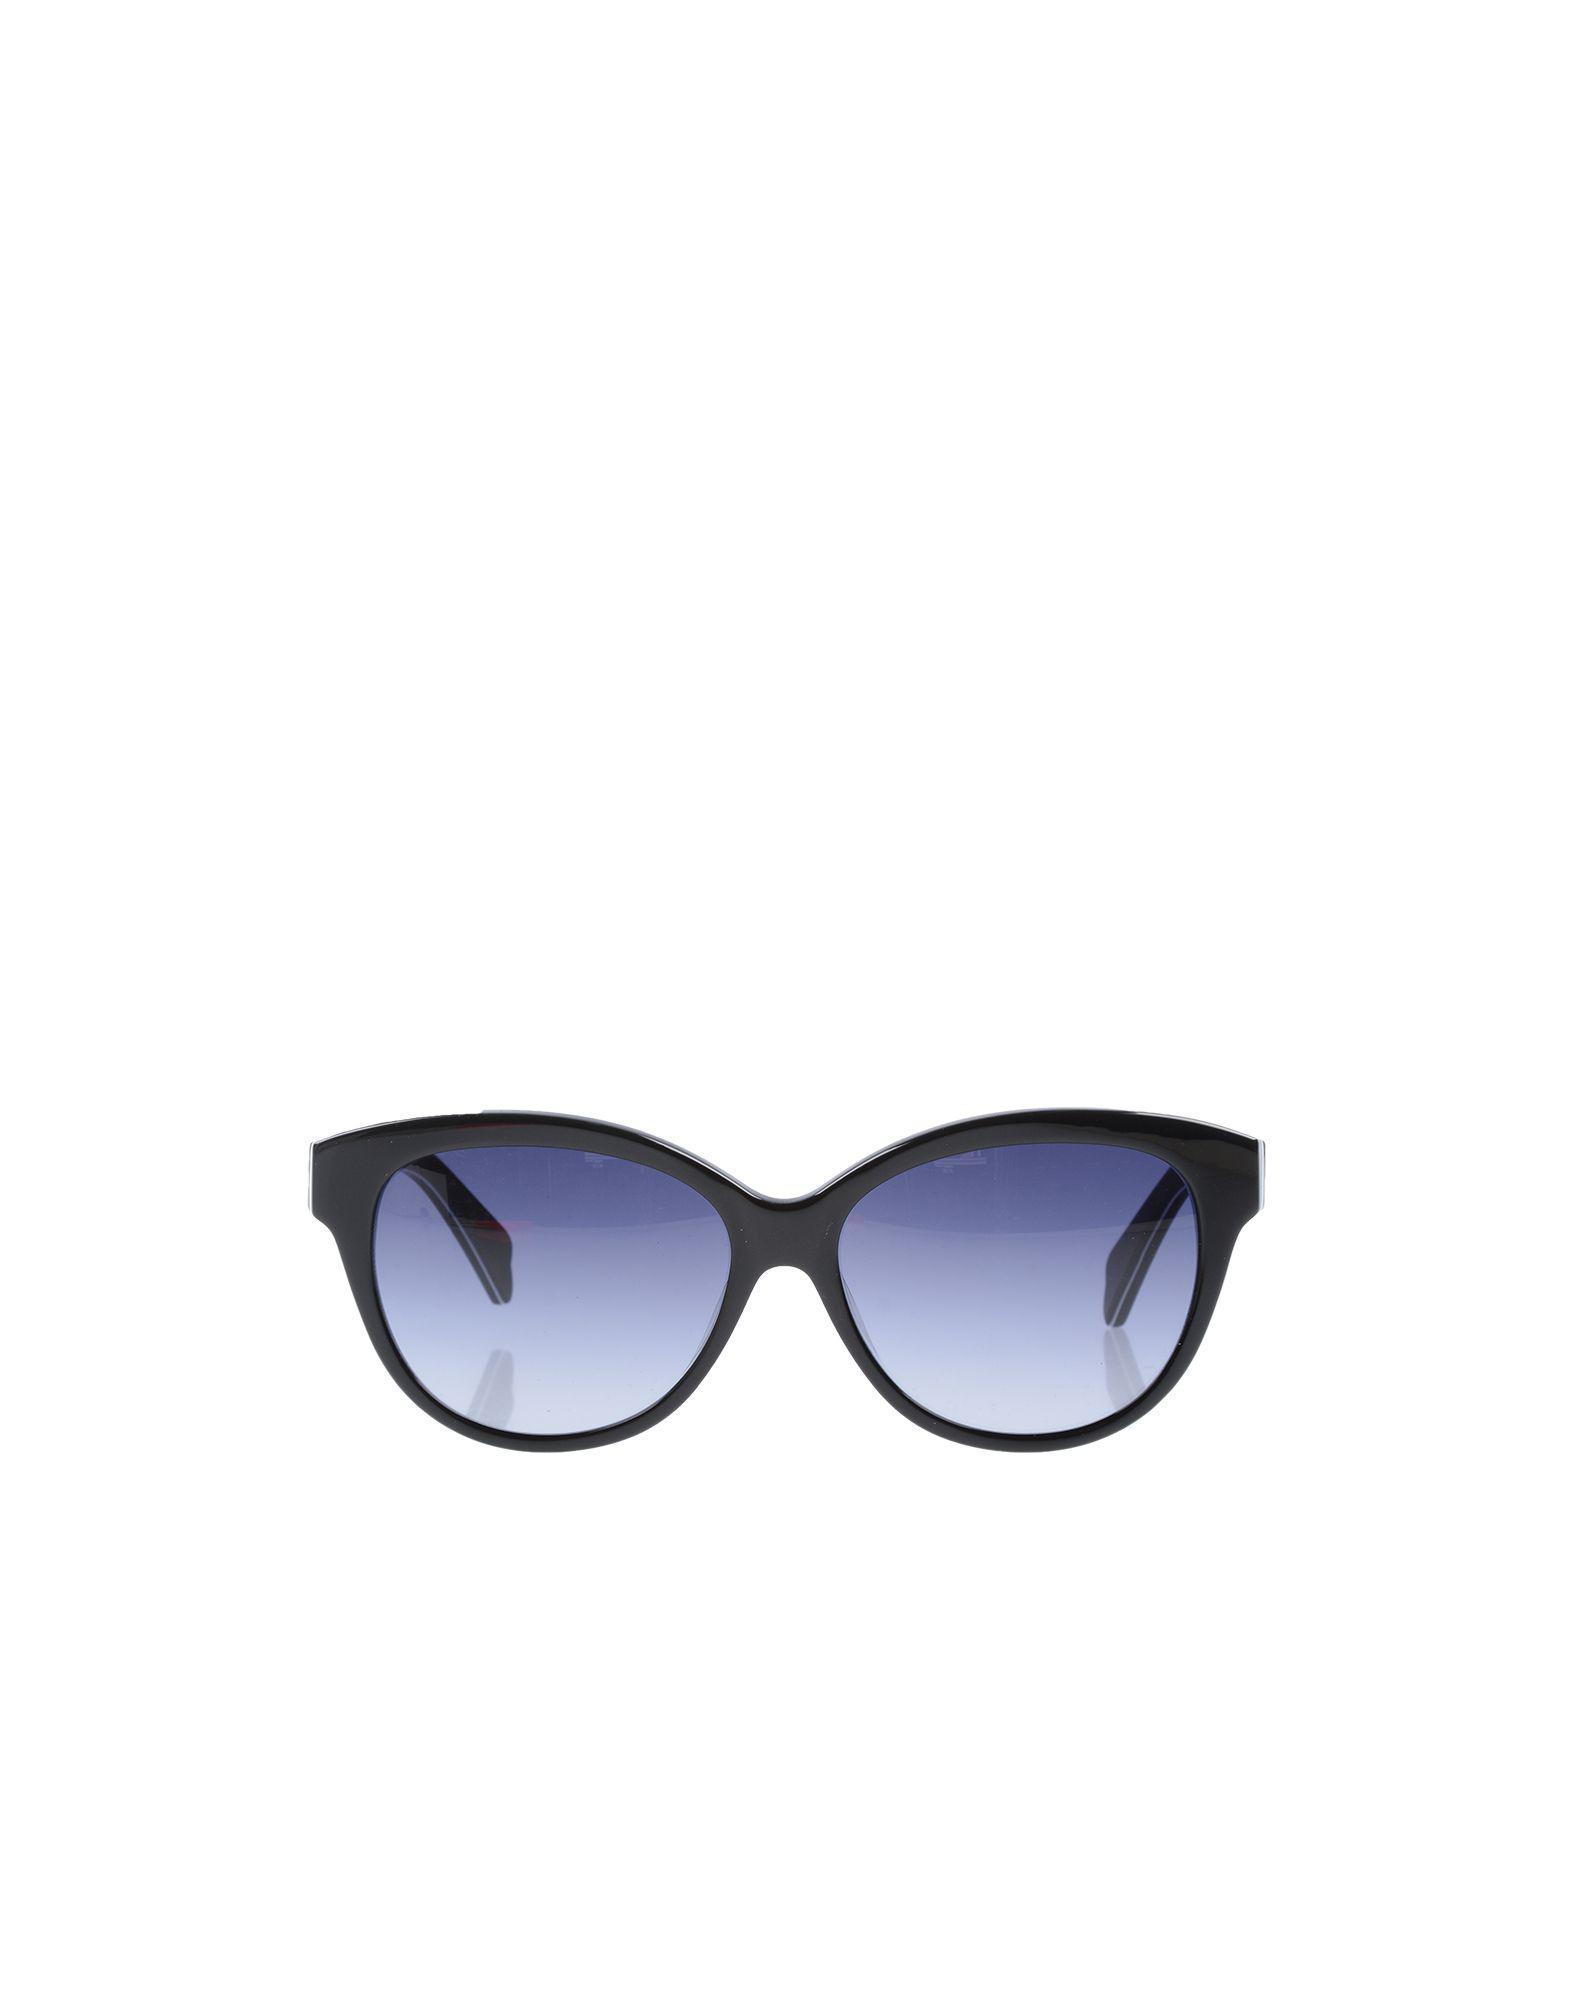 f0930fe8626 Just Cavalli Sunglasses in Black - Lyst